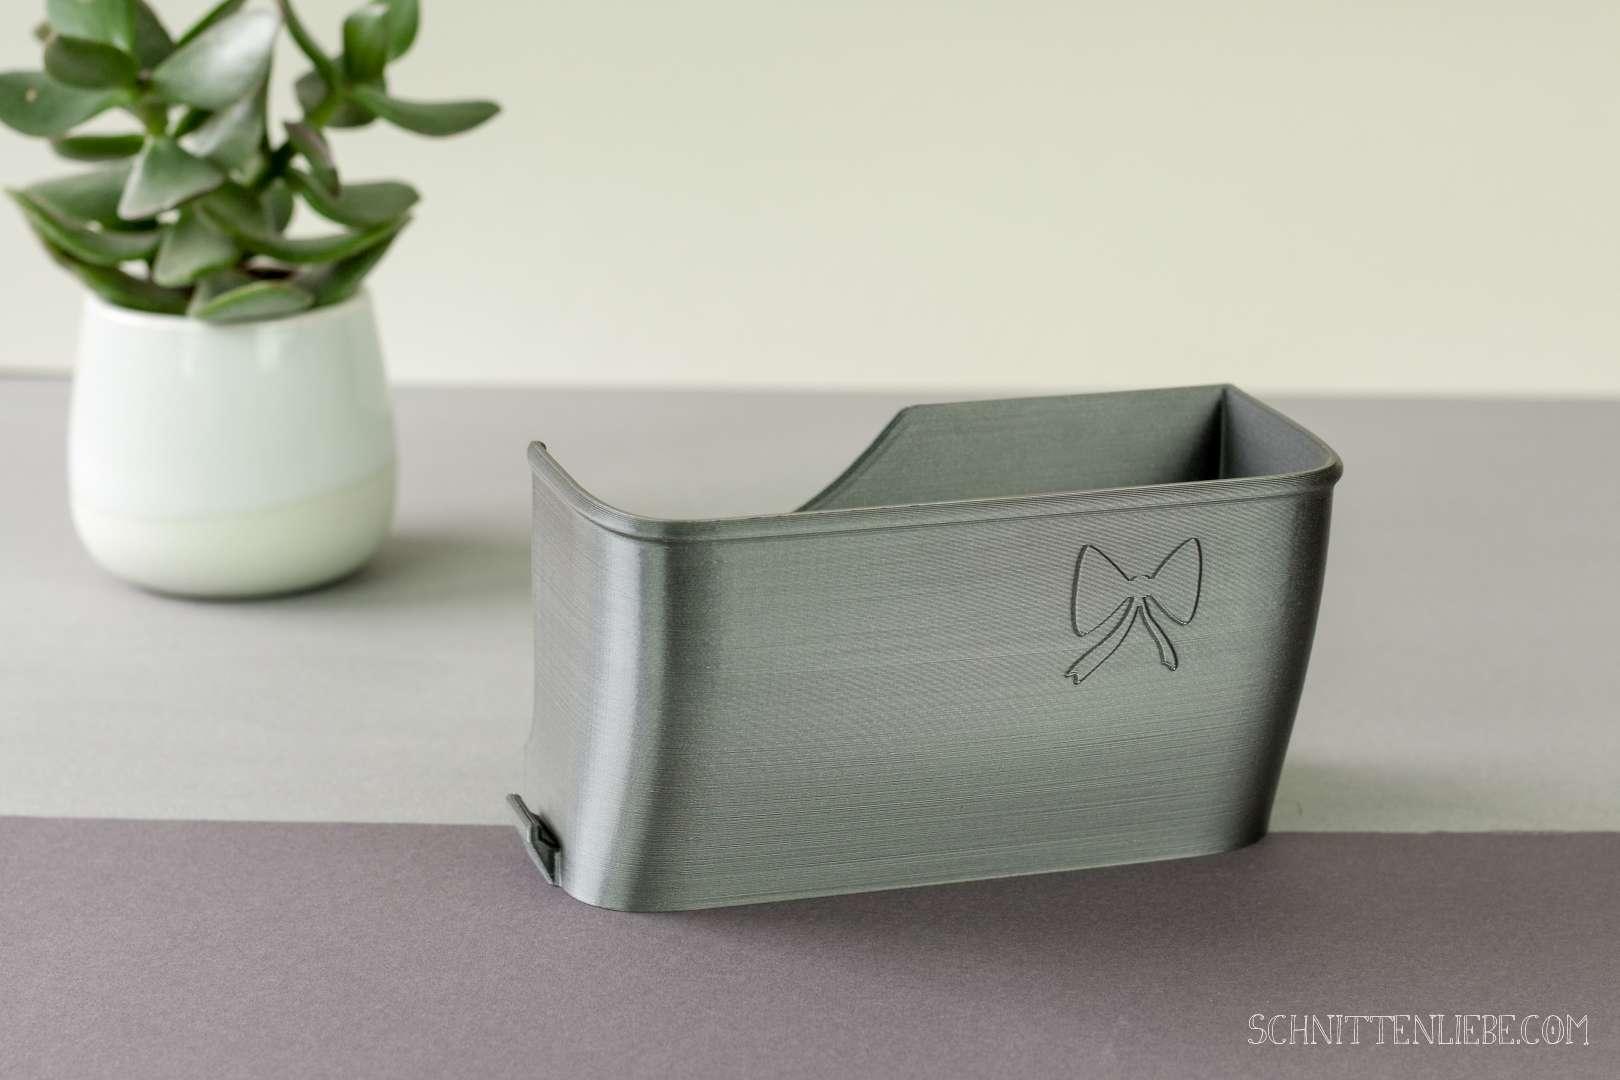 Schnittenliebe 3D Auffangbehälter Gritzner 788 metallic